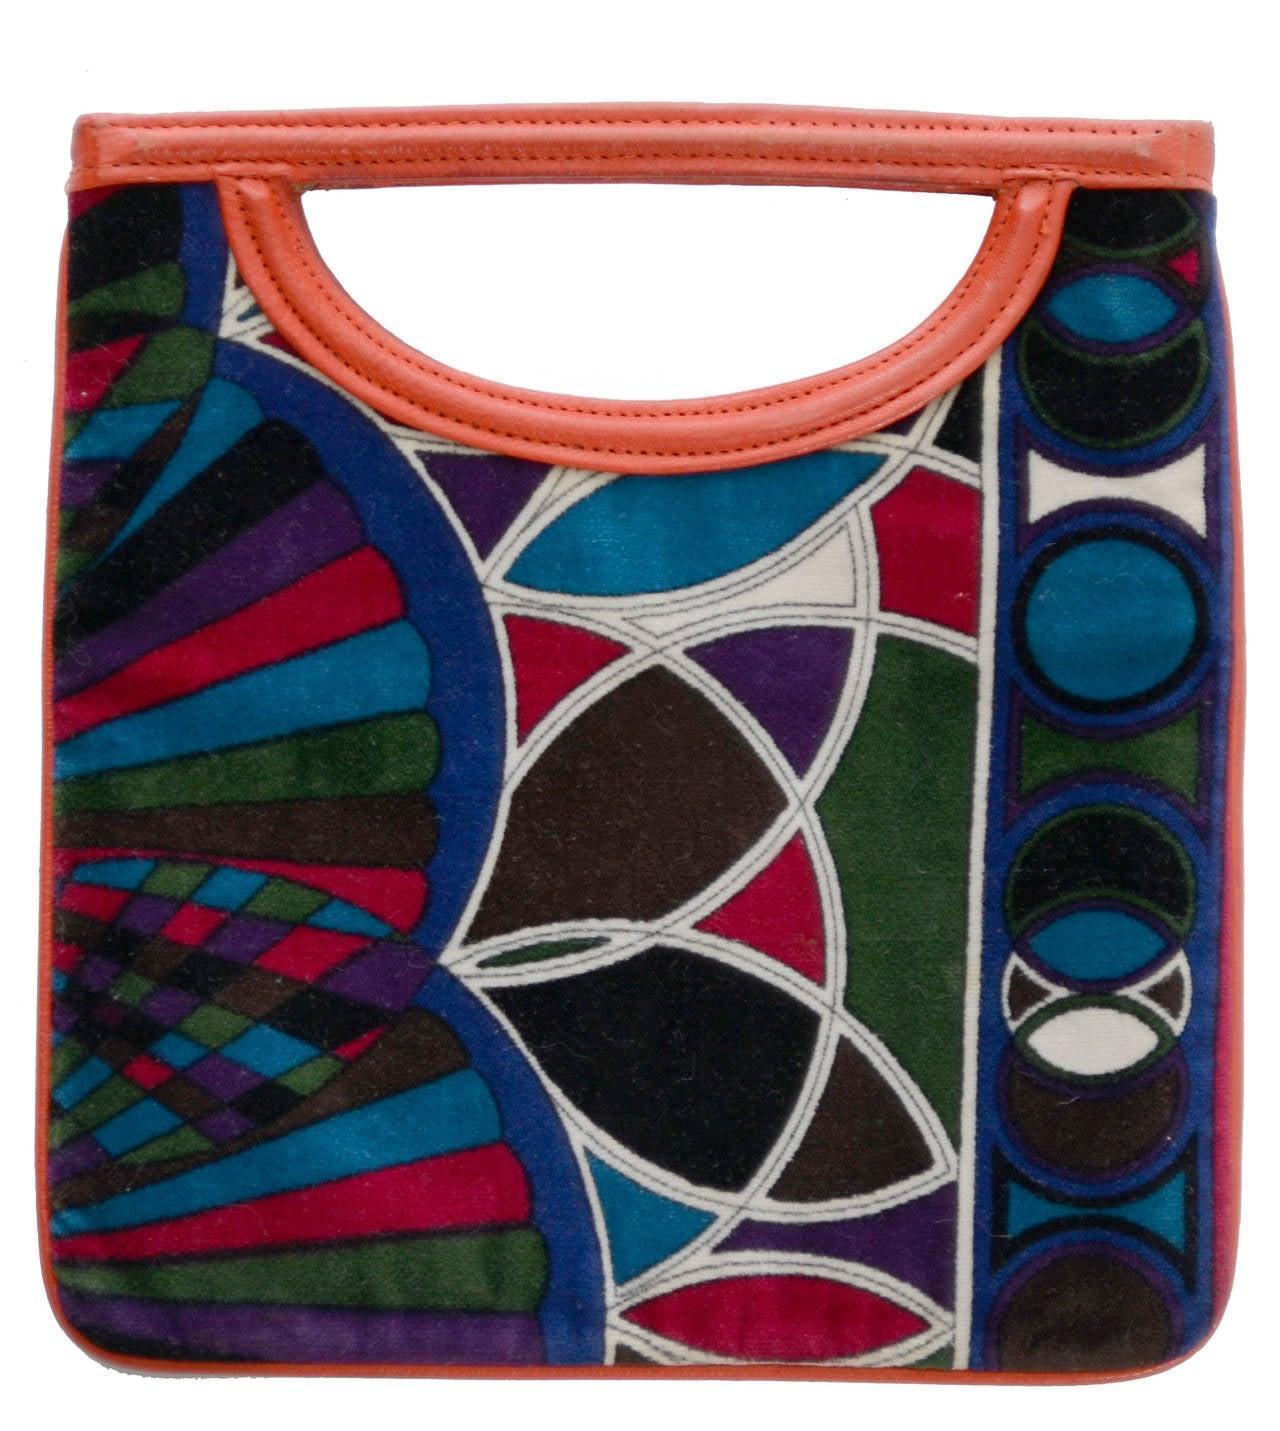 Women's 1960s Rare Emilio Pucci Jana Vintage Velvet Handbag Mod Geometric OpArt Rare Bag For Sale